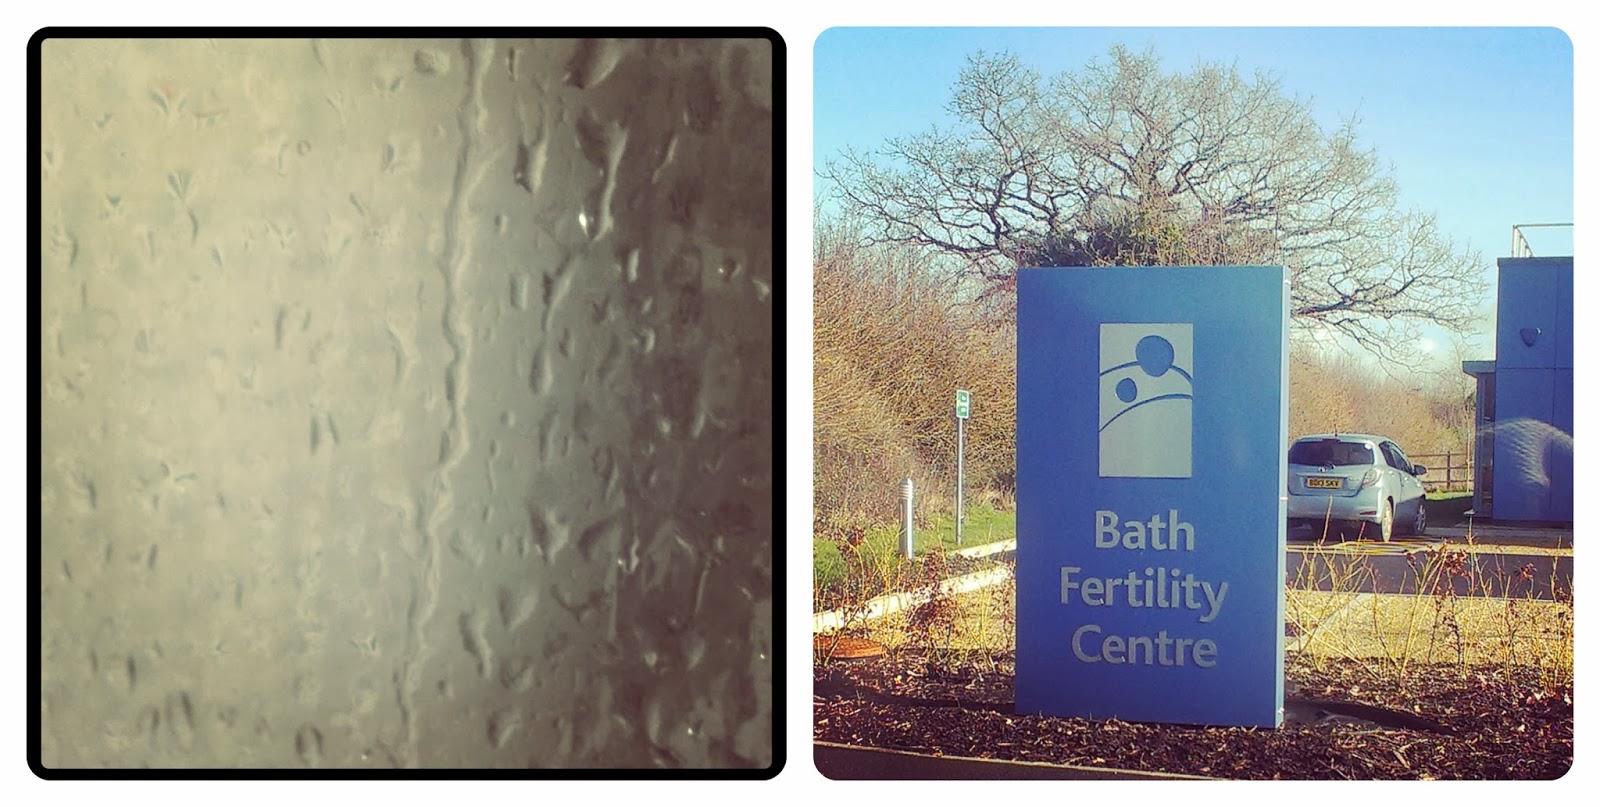 Shower water droplets - Bath Fertility Clinic in the sunshine